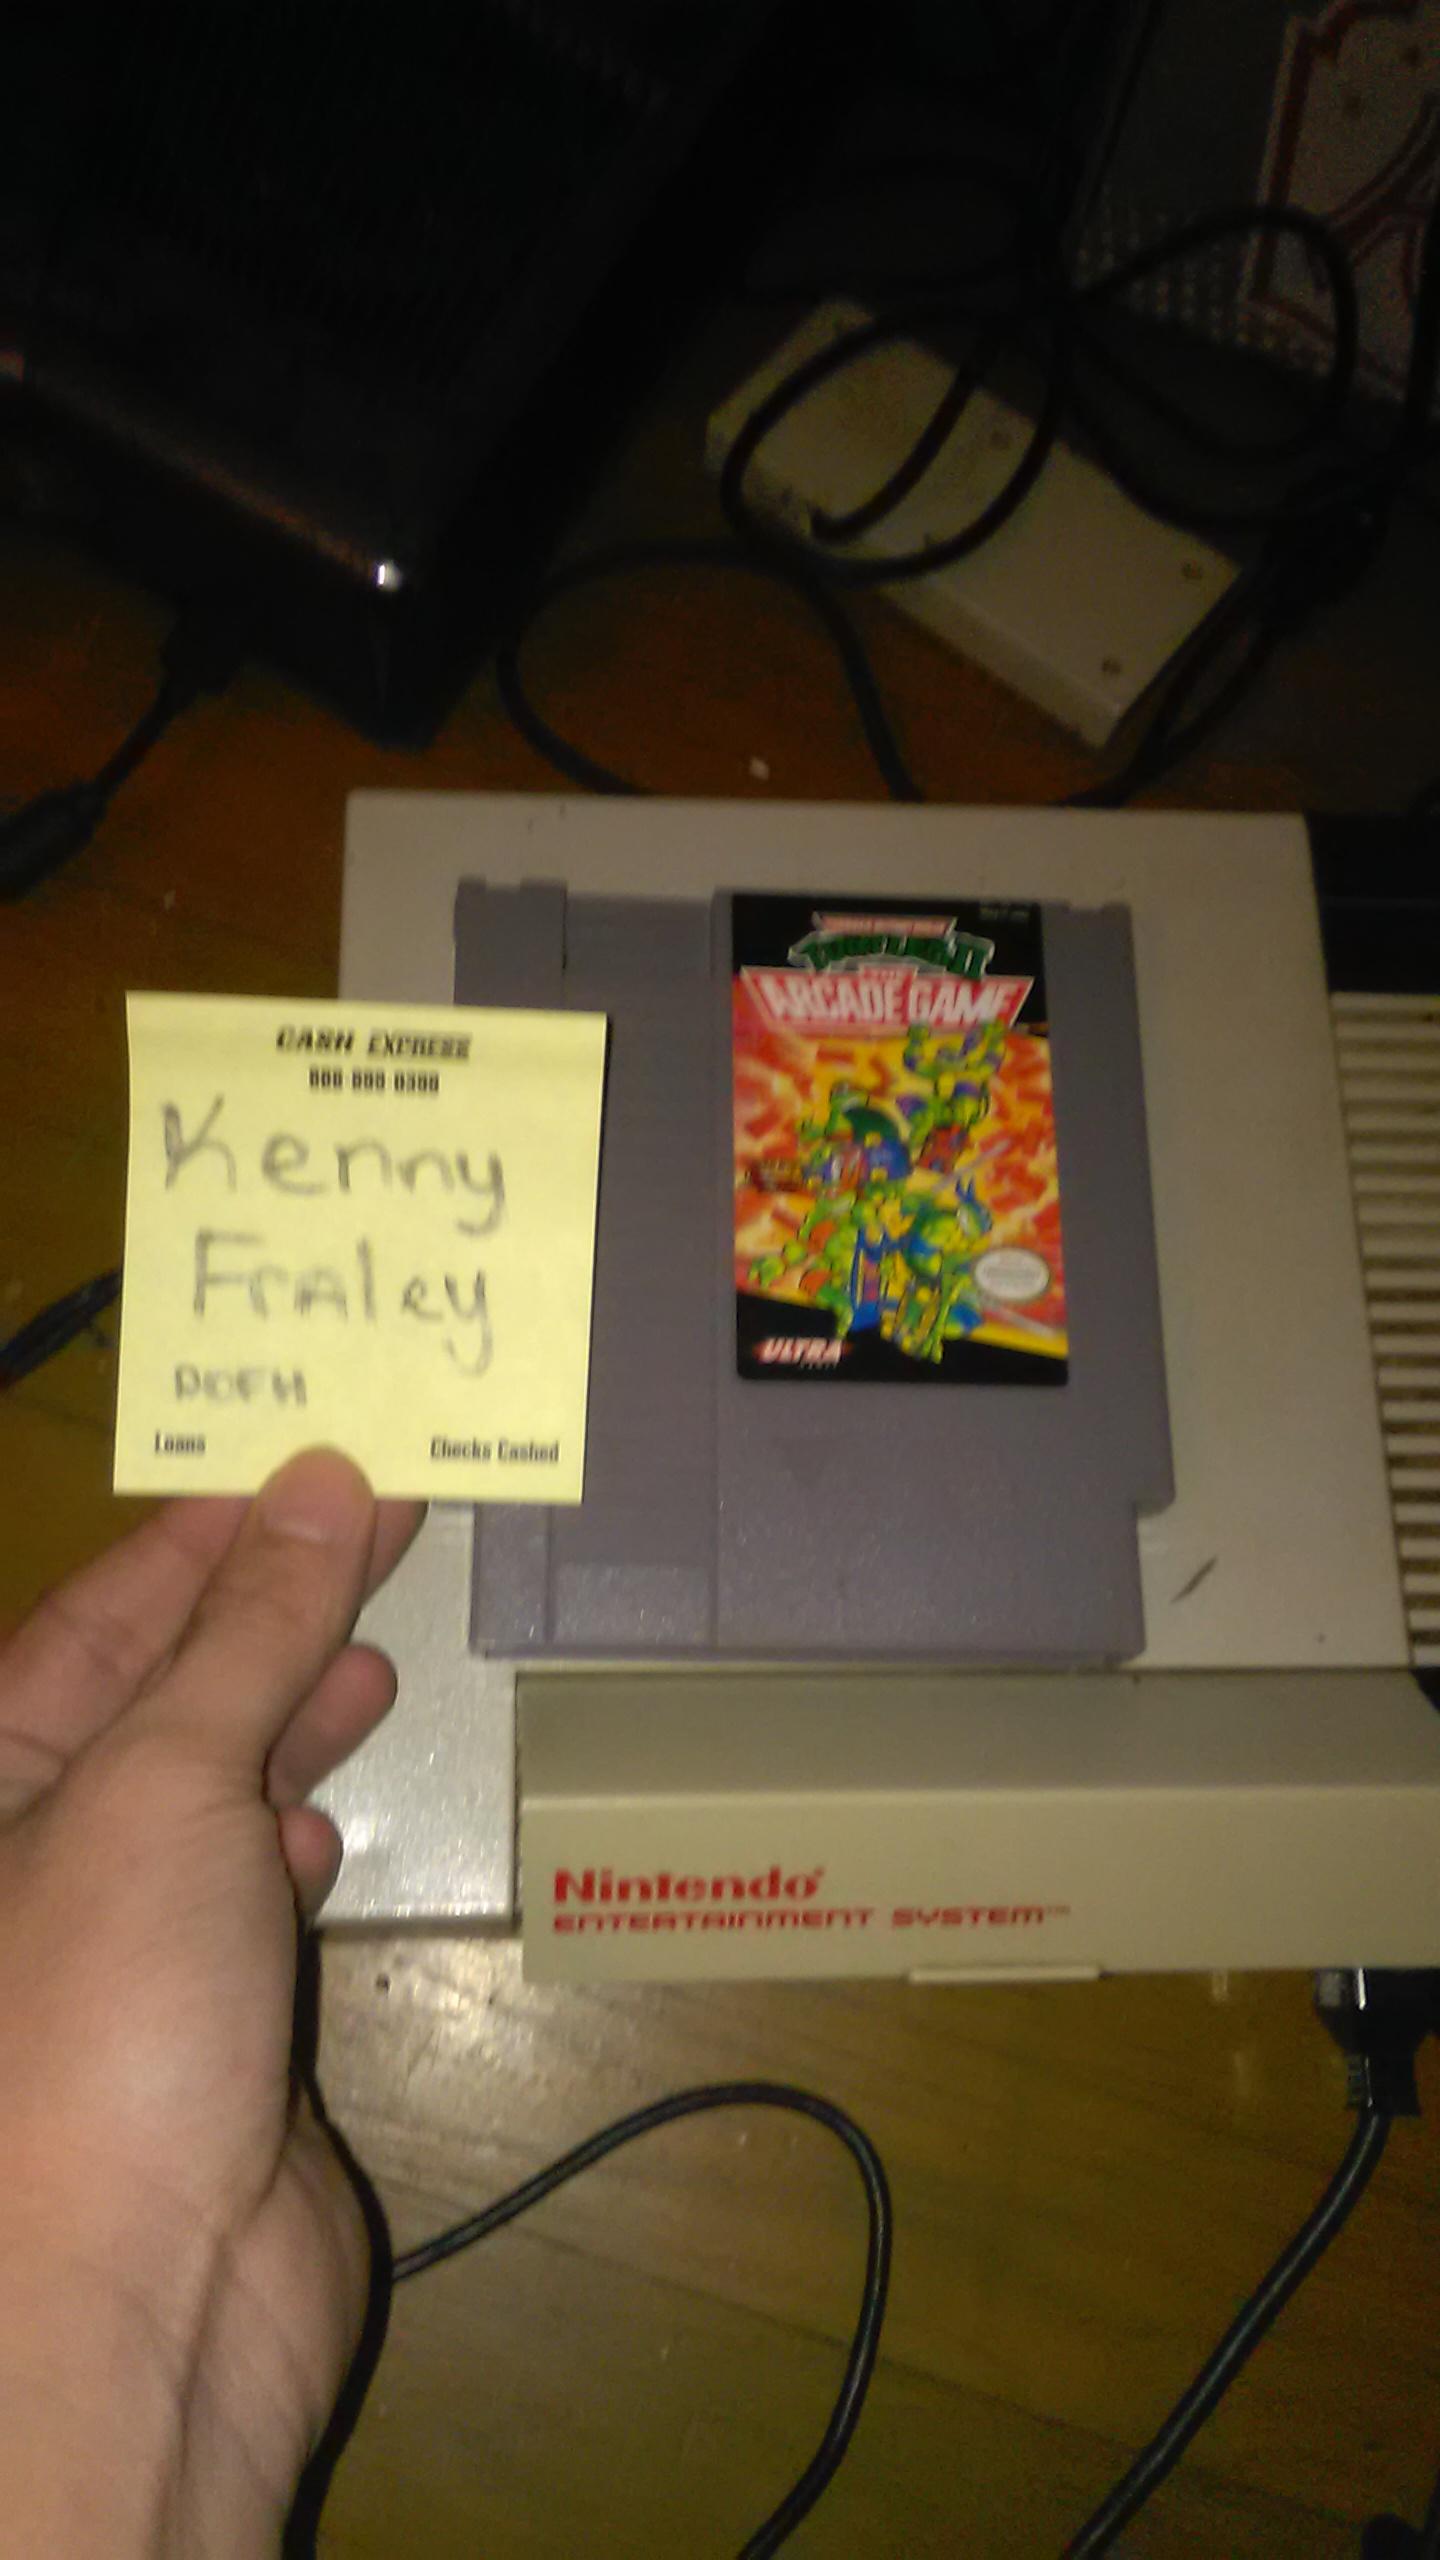 kennyfraley: Teenage Mutant Ninja Turtles II: The Arcade Game (NES/Famicom) 160 points on 2016-09-30 22:29:33